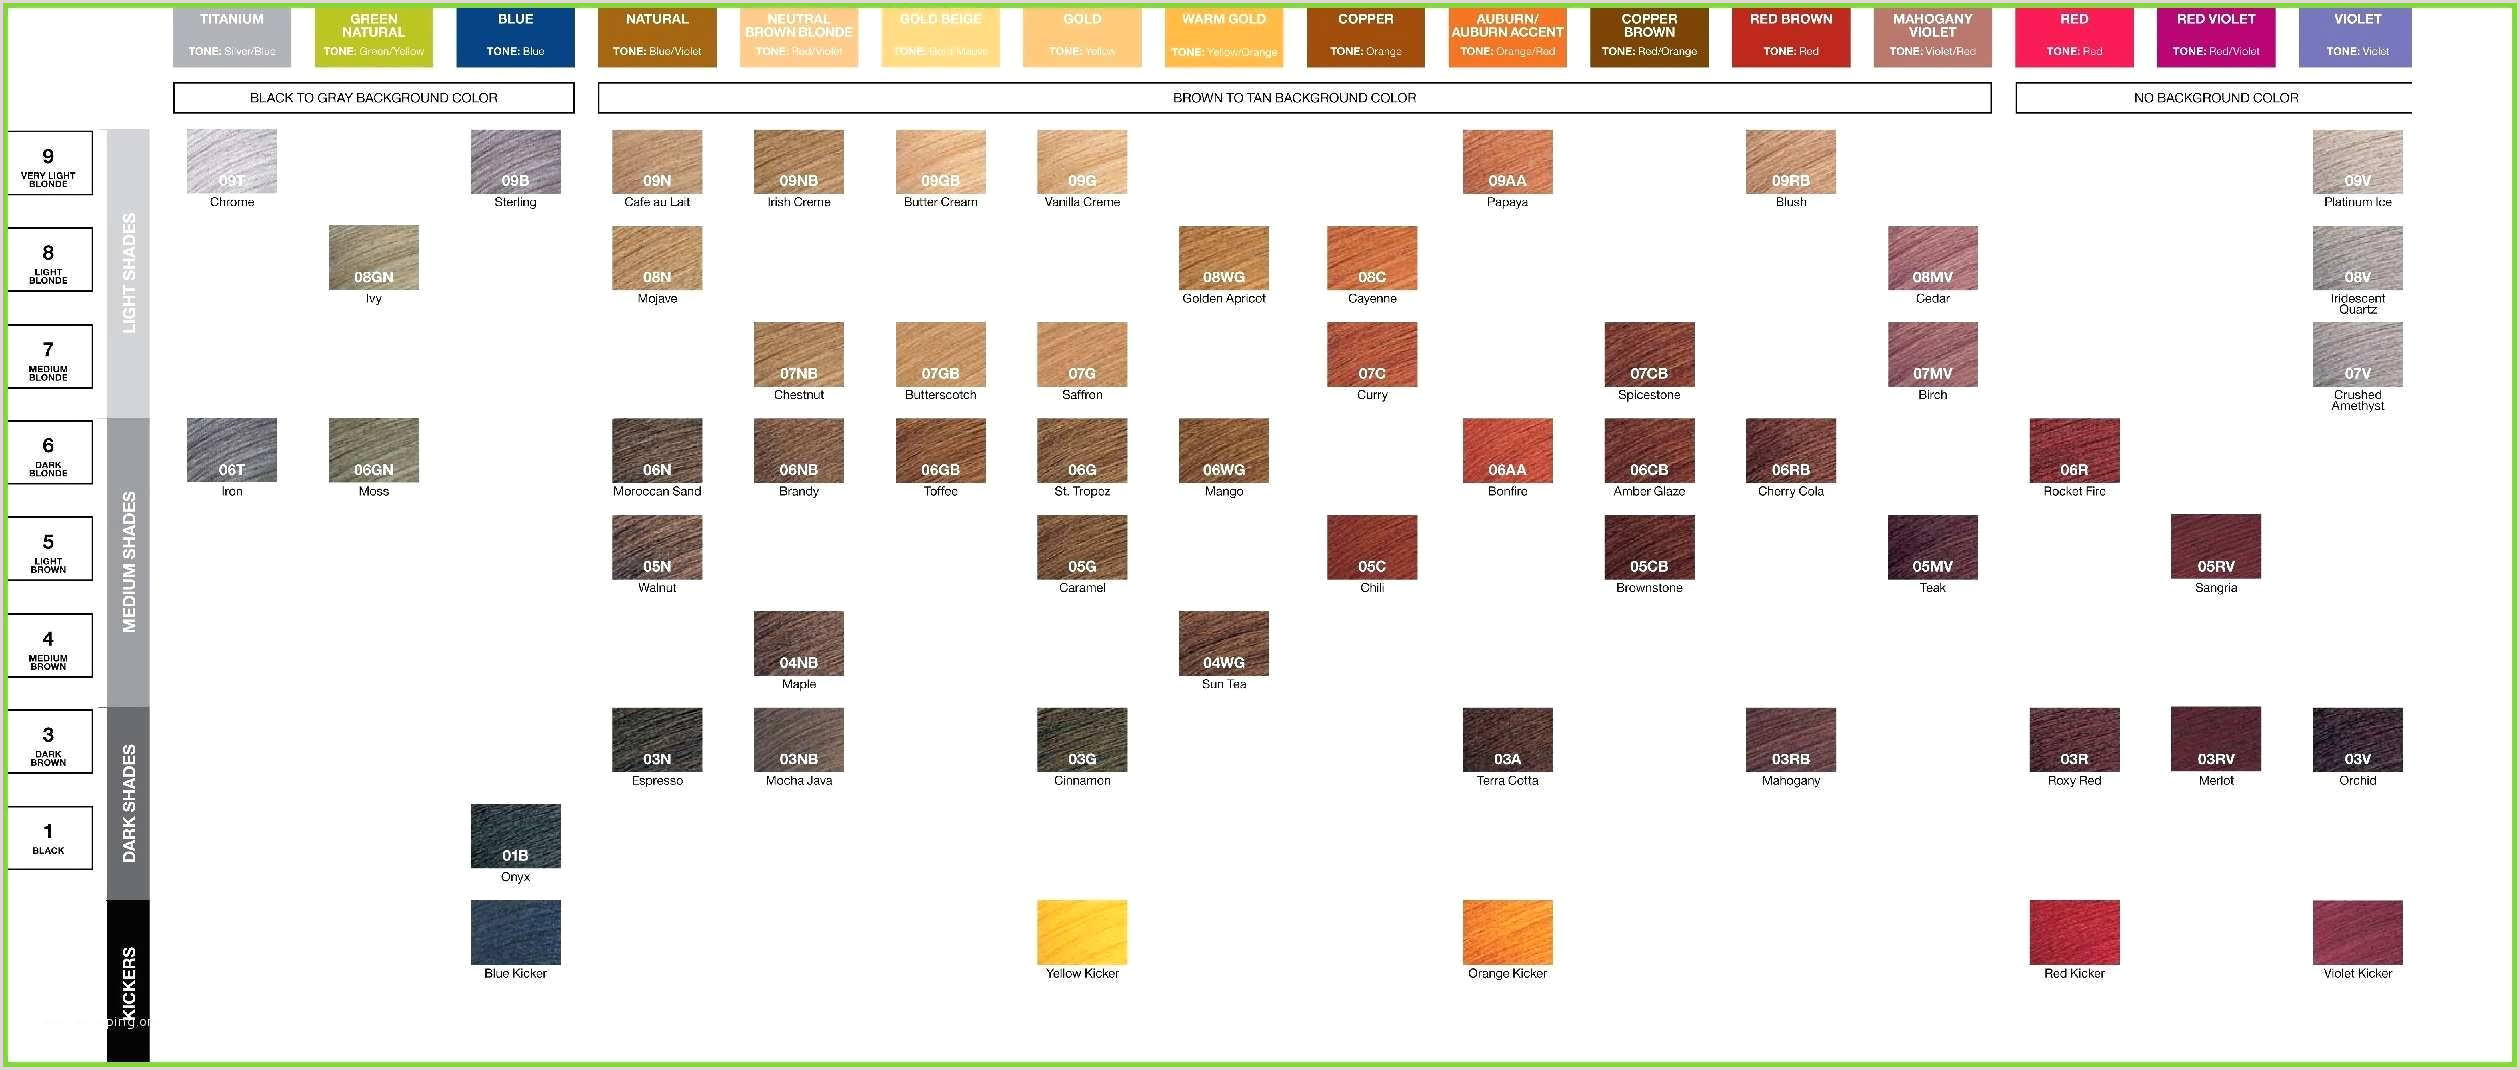 Redken Demi Color Chart ✓ Free Collections 33 Redken Demi Permanent Hair Color Chart